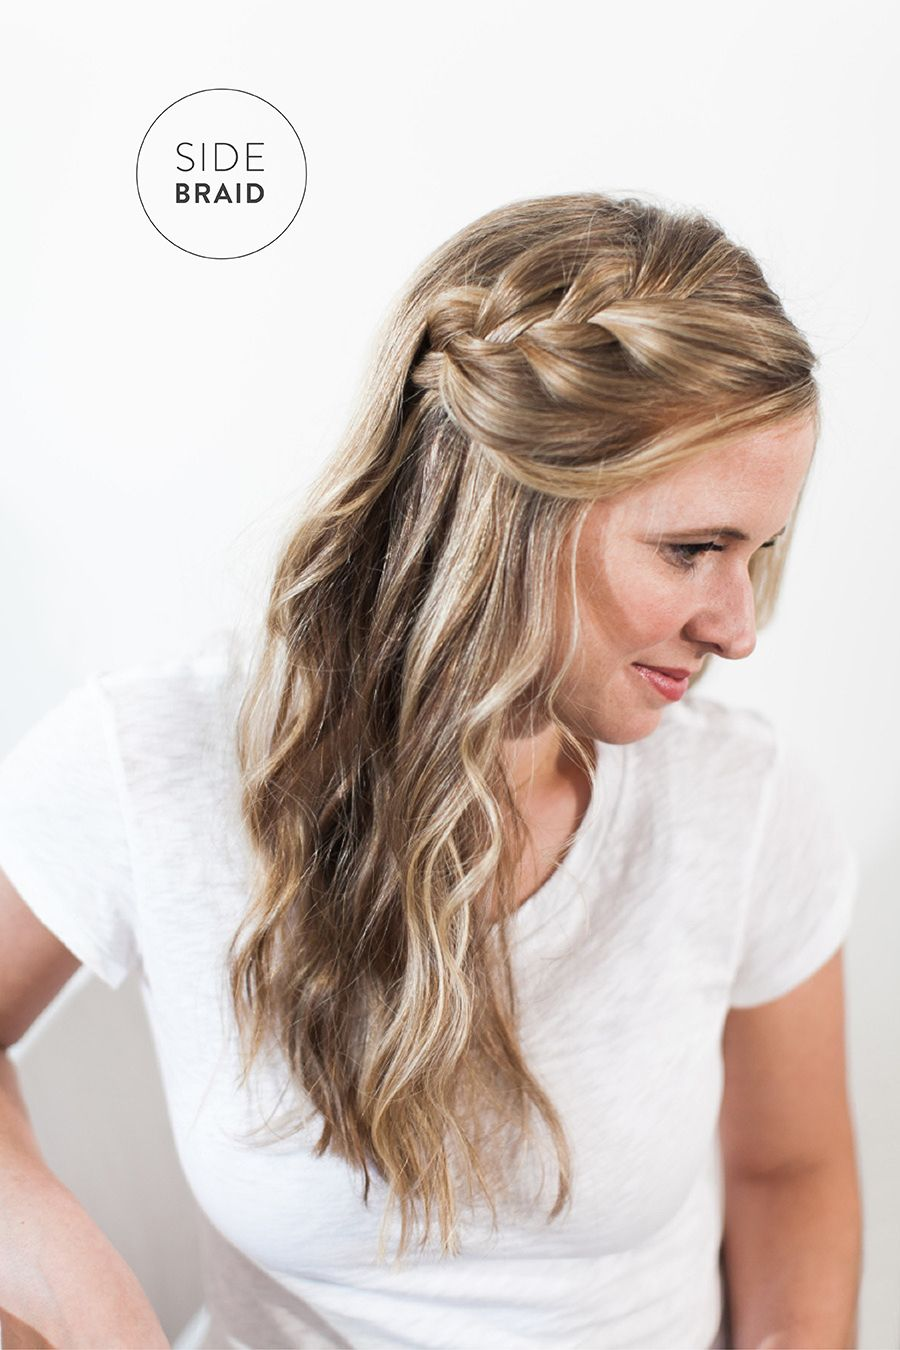 Bridal Beauty Side Braid With A Loose Twist Hair Styles Hair Beauty Hairdo